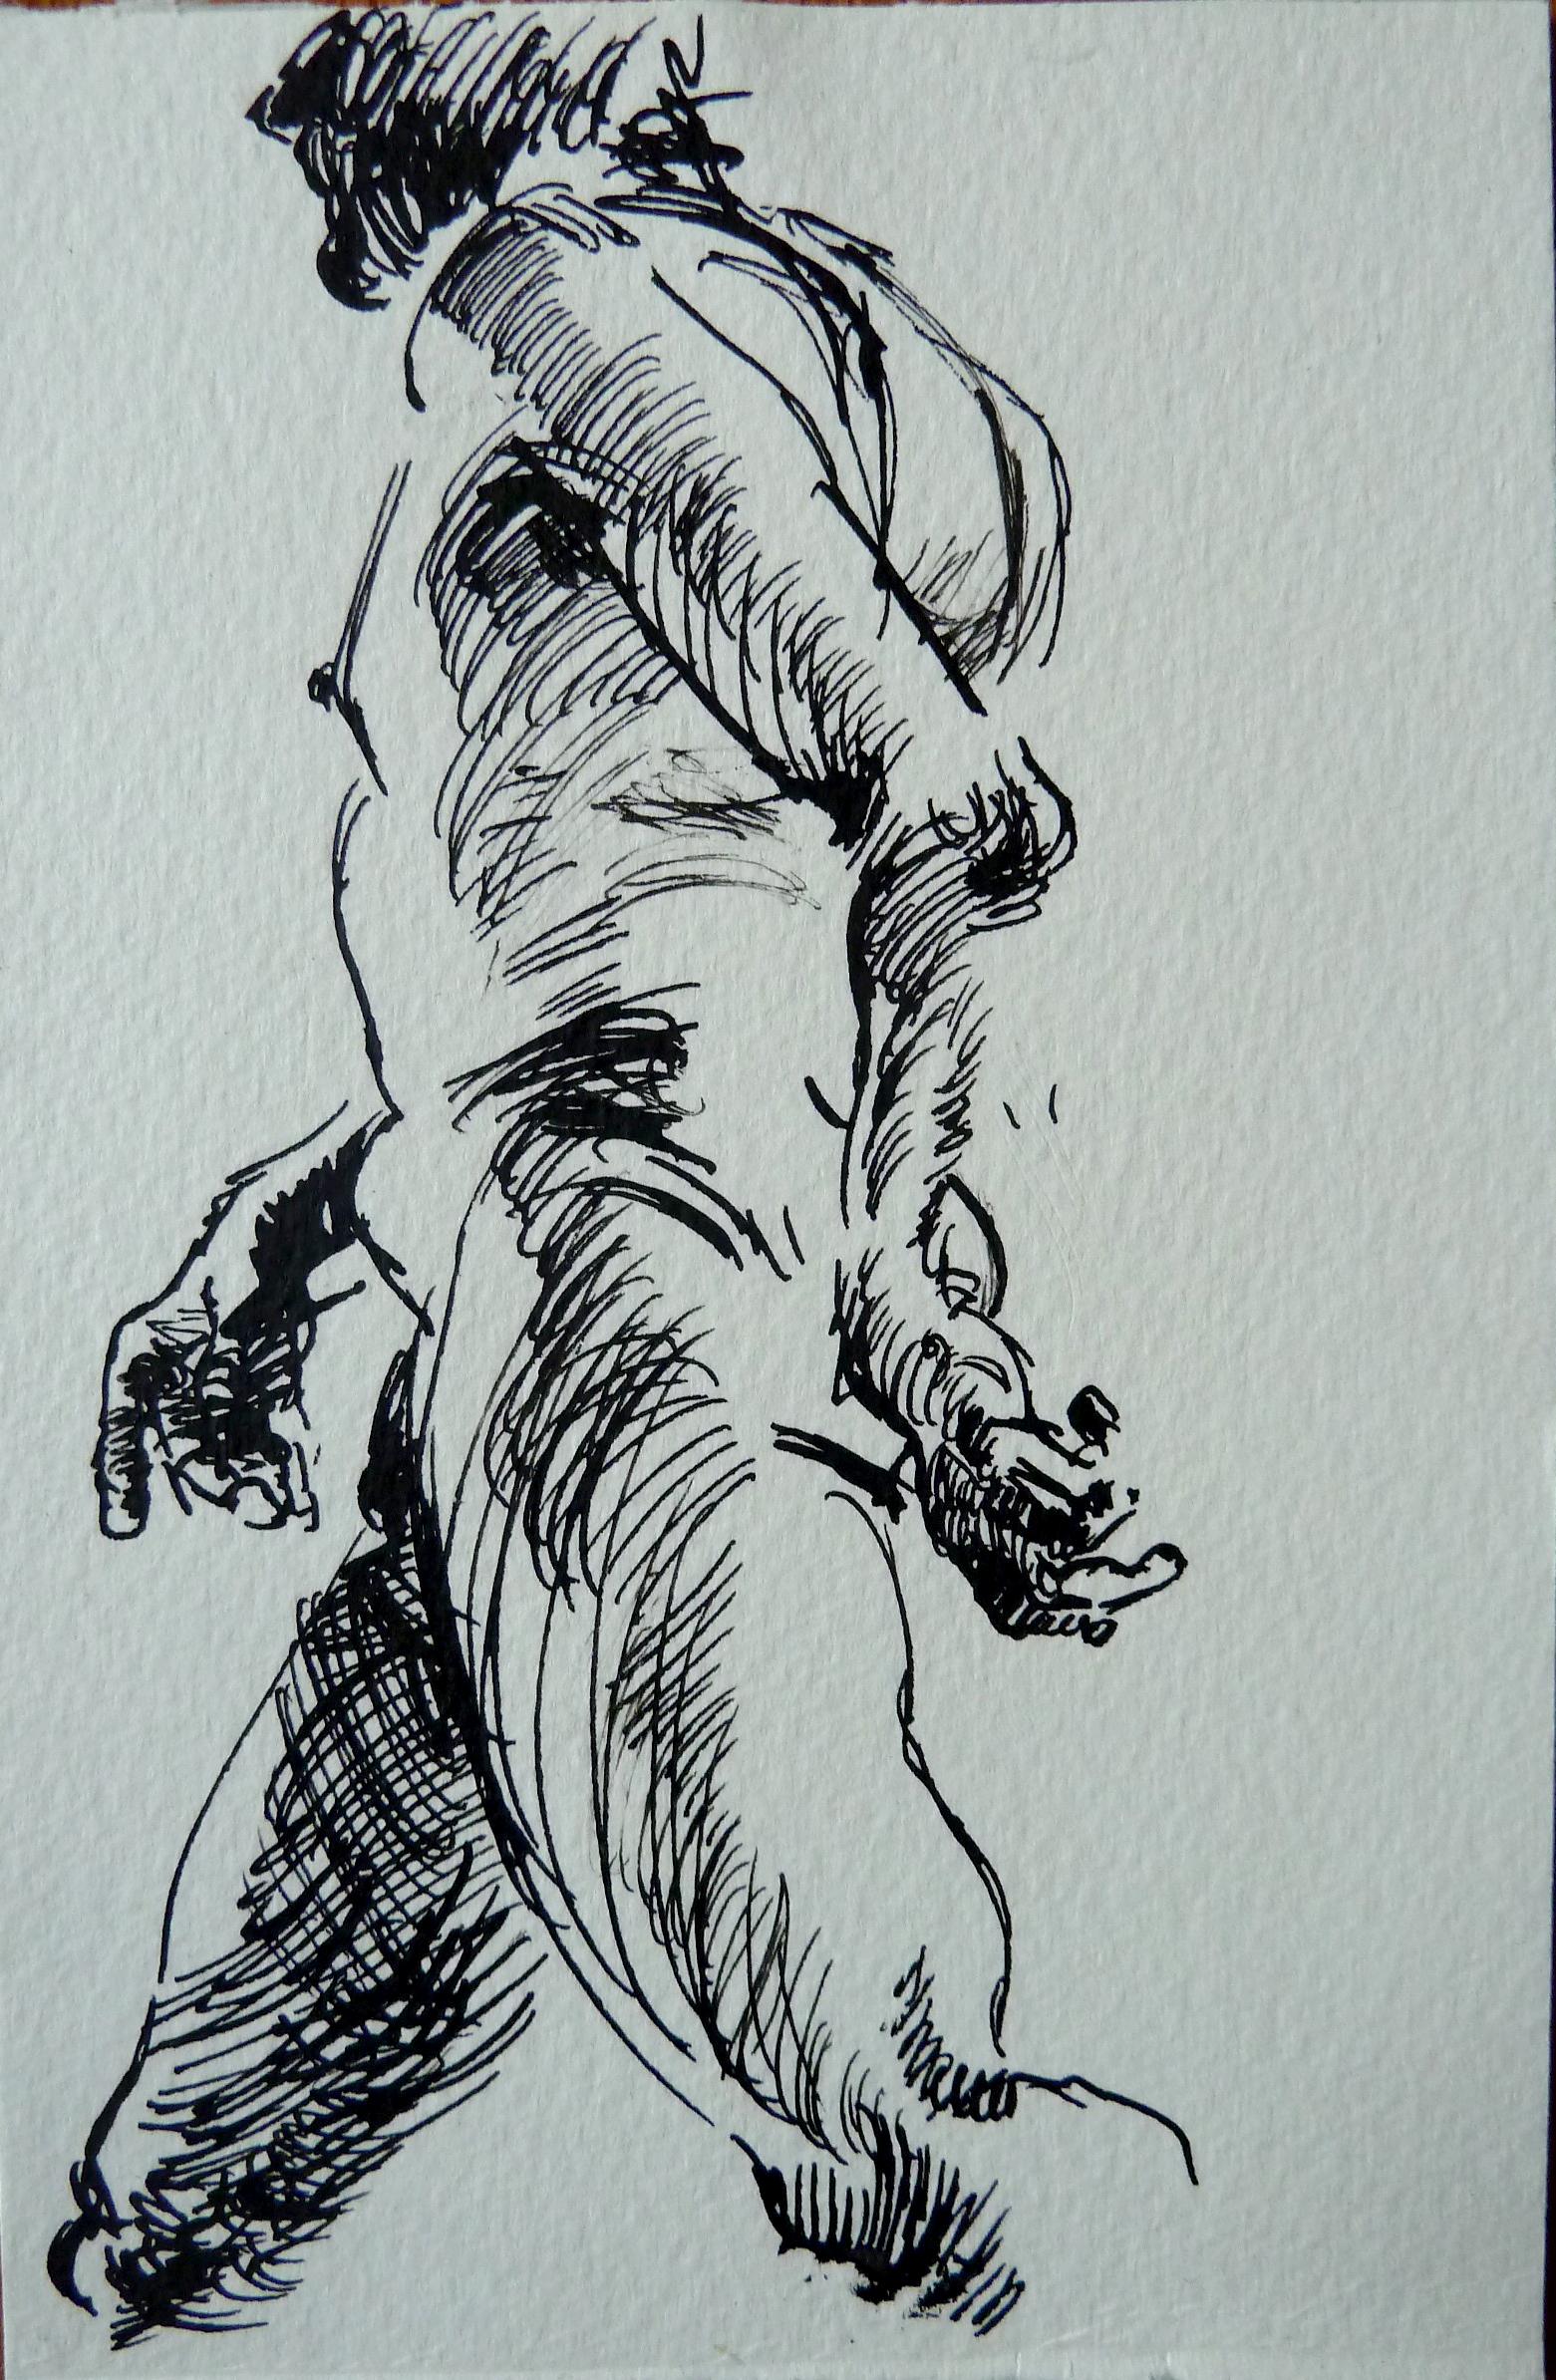 "Male model, Ink on watercolor paper, 7"" x 5"""